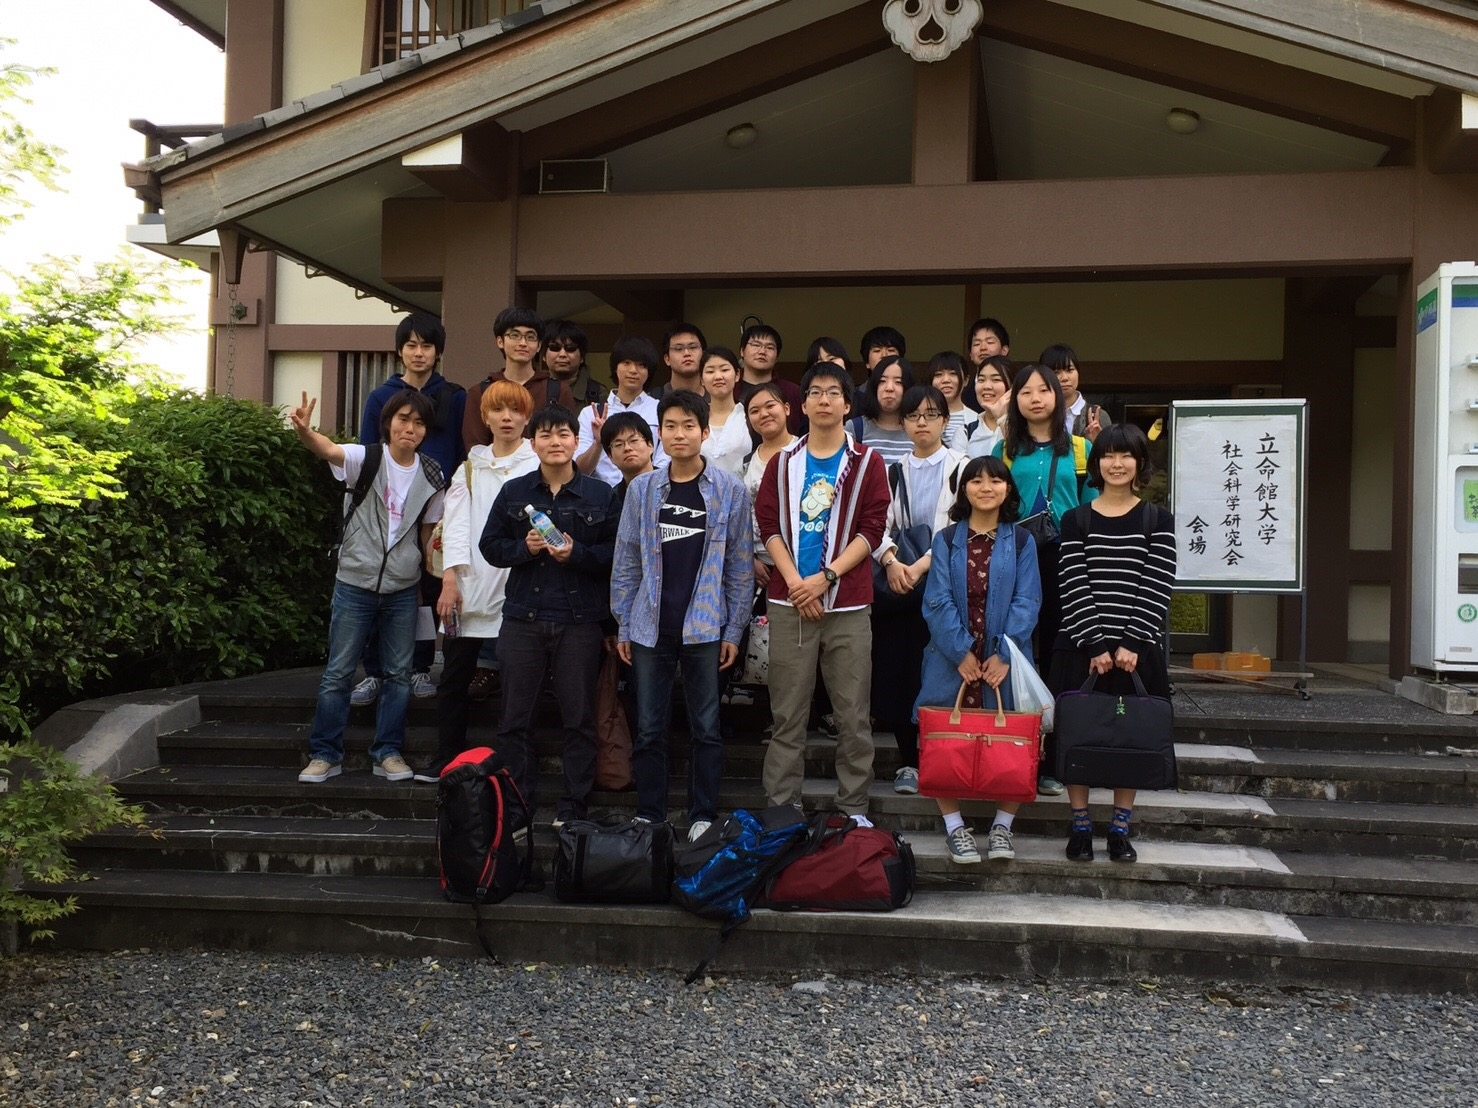 K-21社会科学研究会